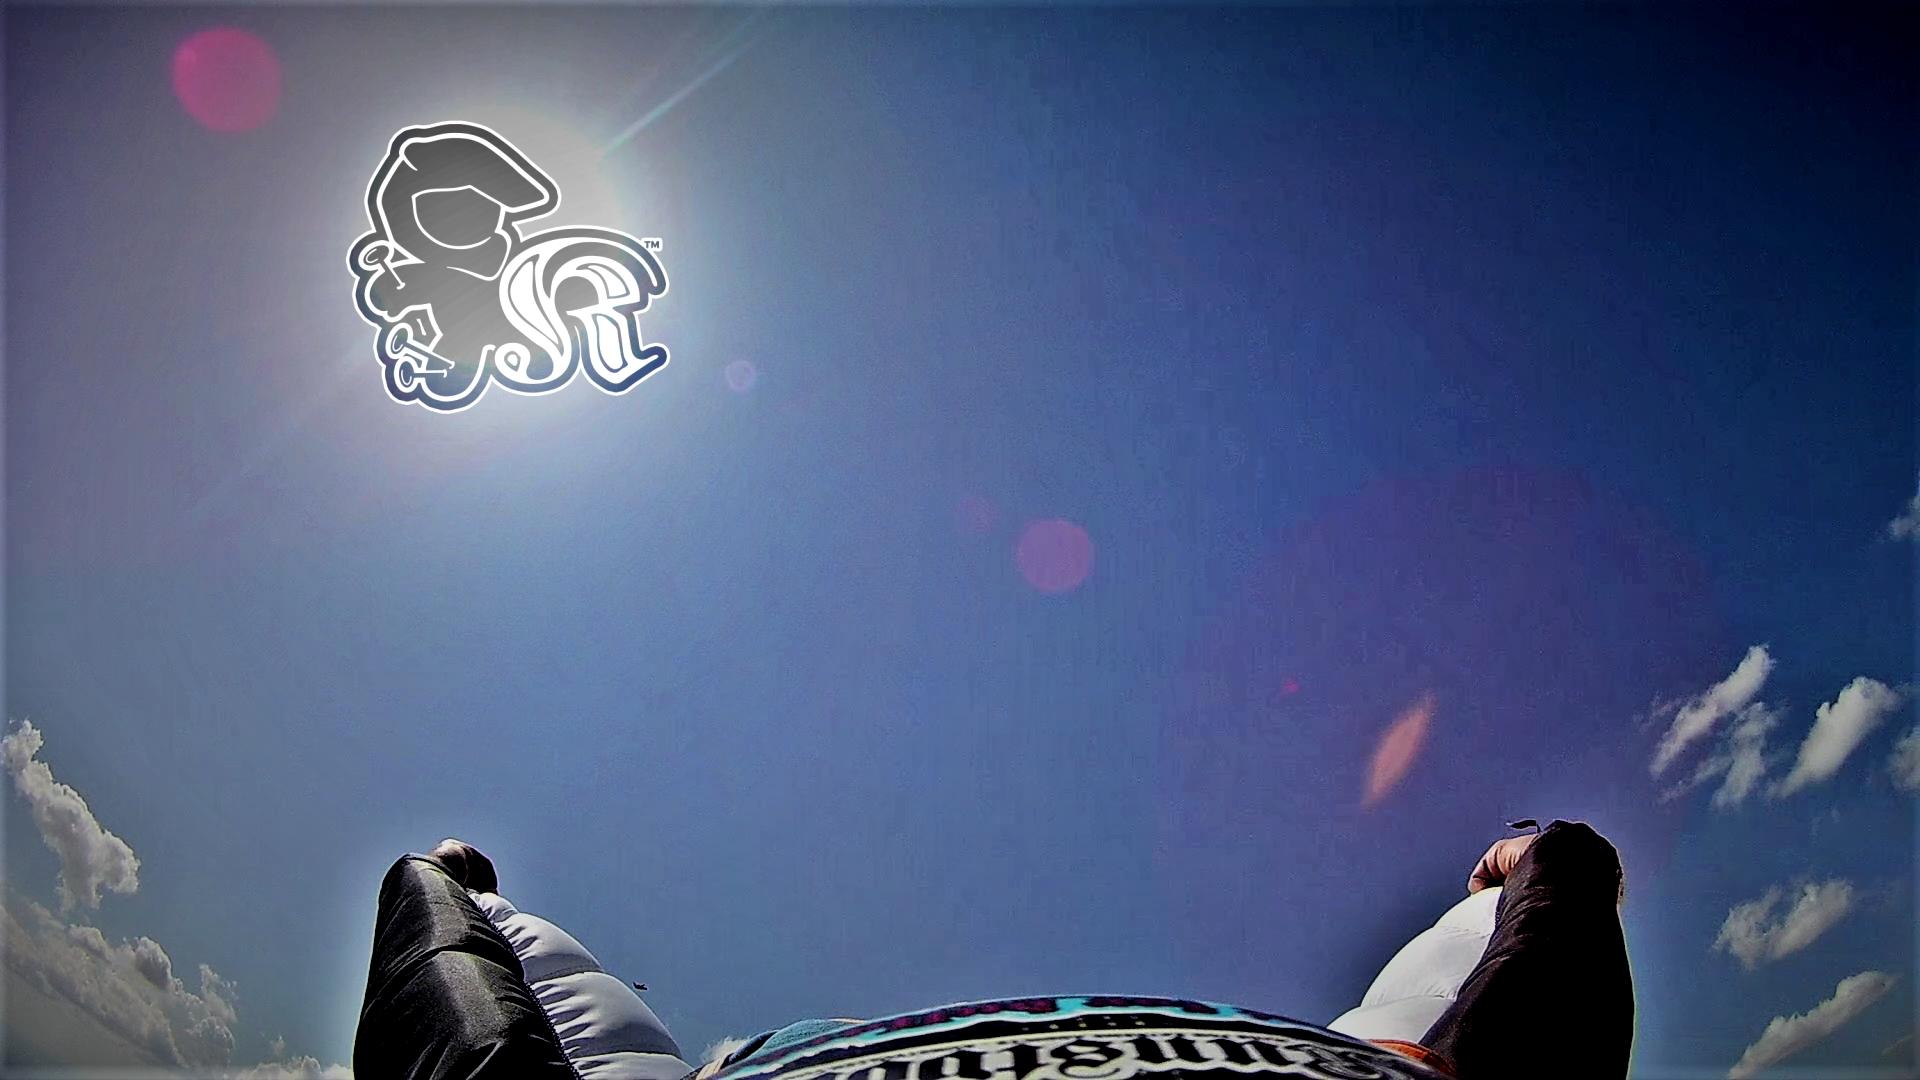 Wingsuit rear view